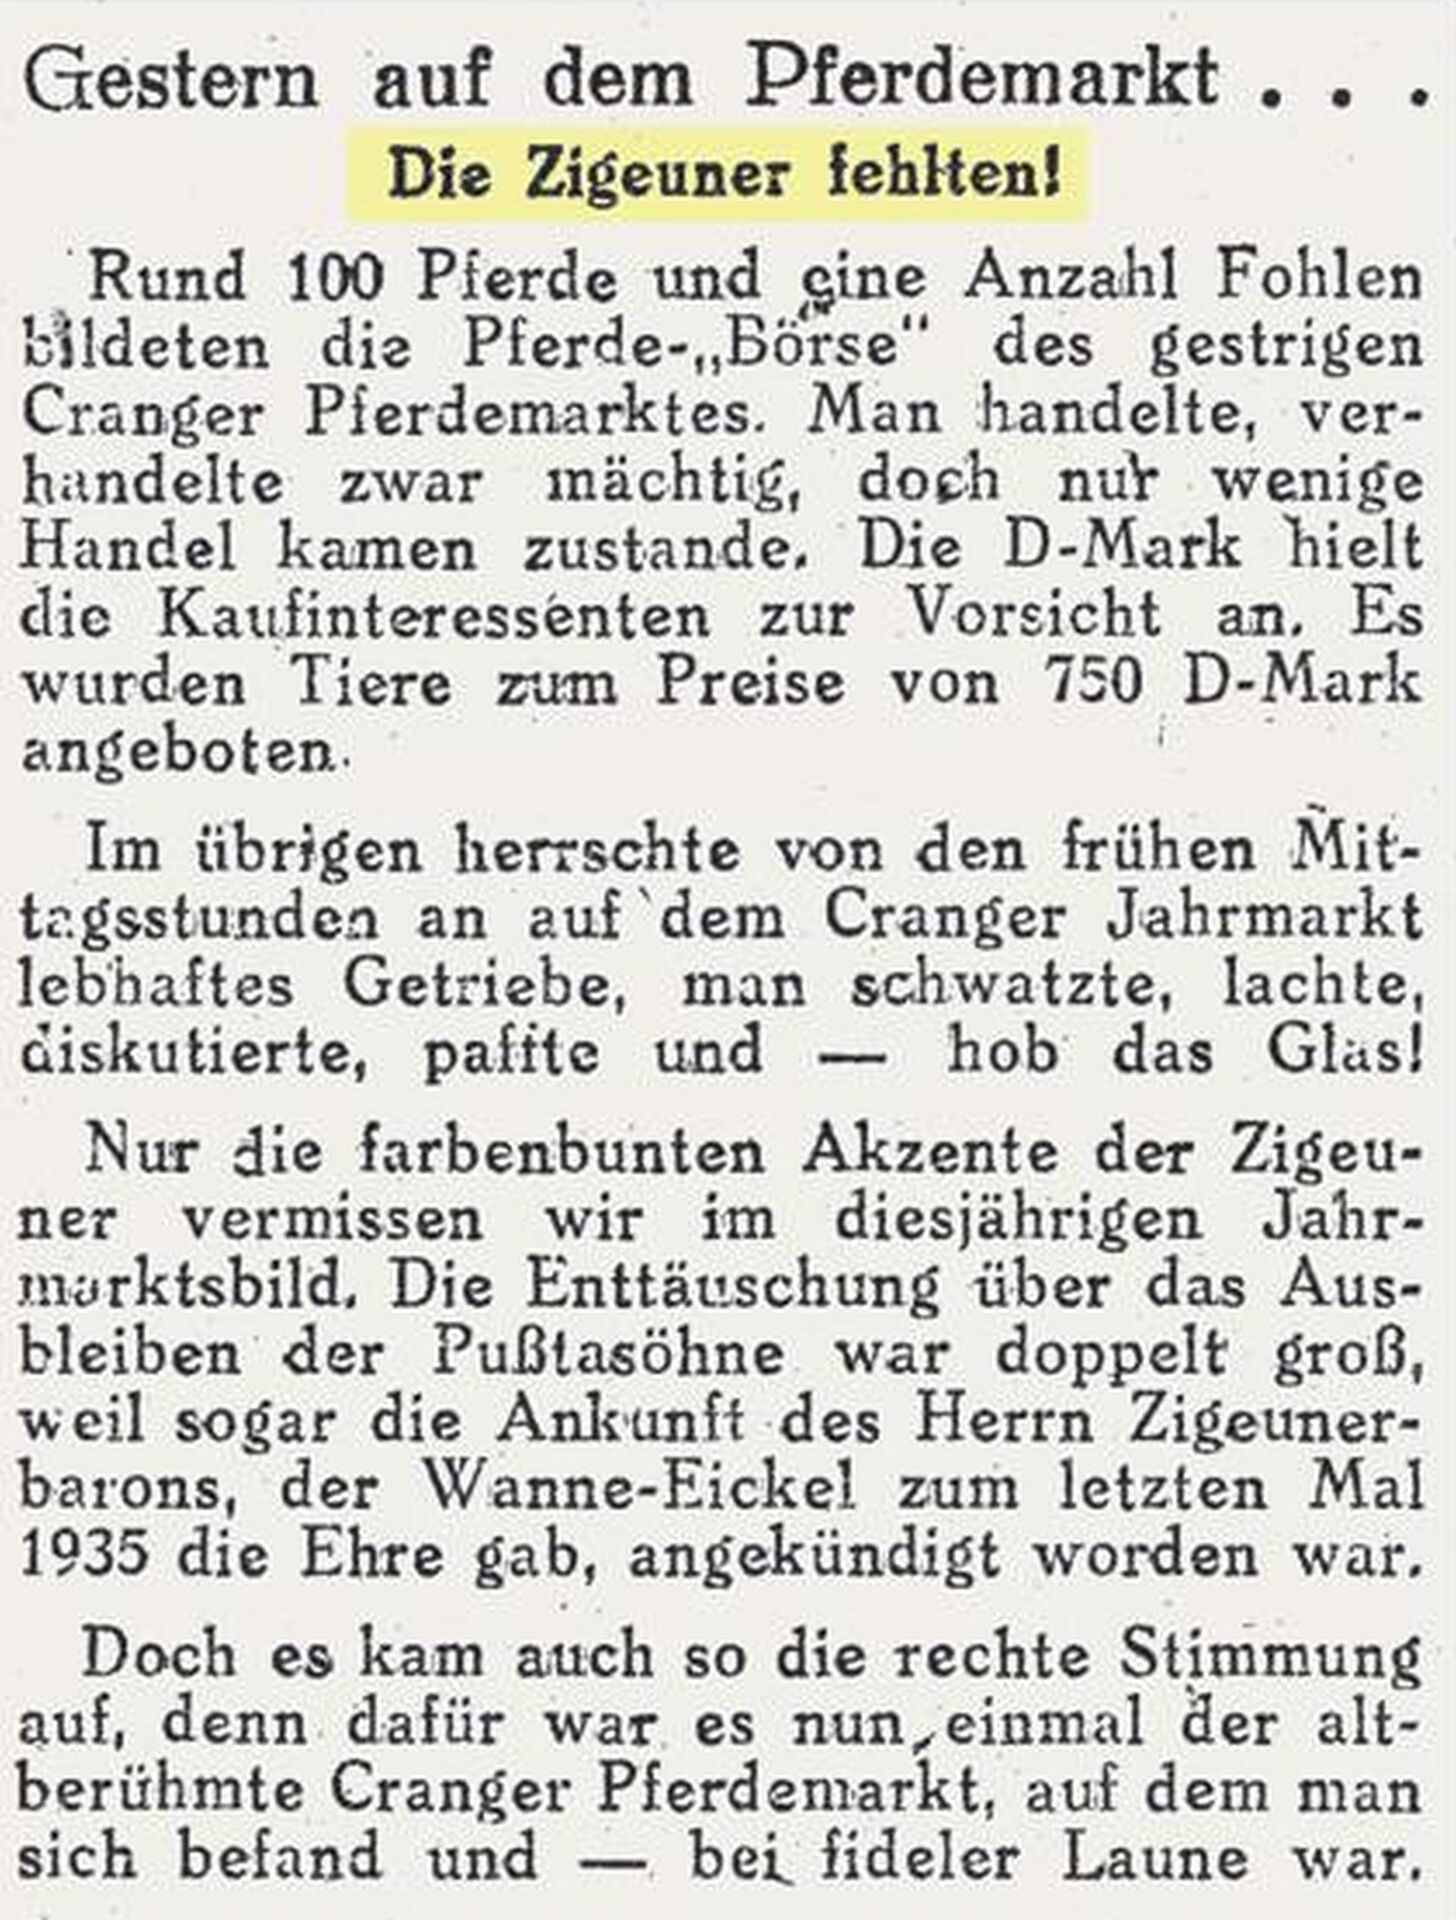 Westfalenpost, Wanne-Eickeler Nachrichten, 07.08.1948.jpg